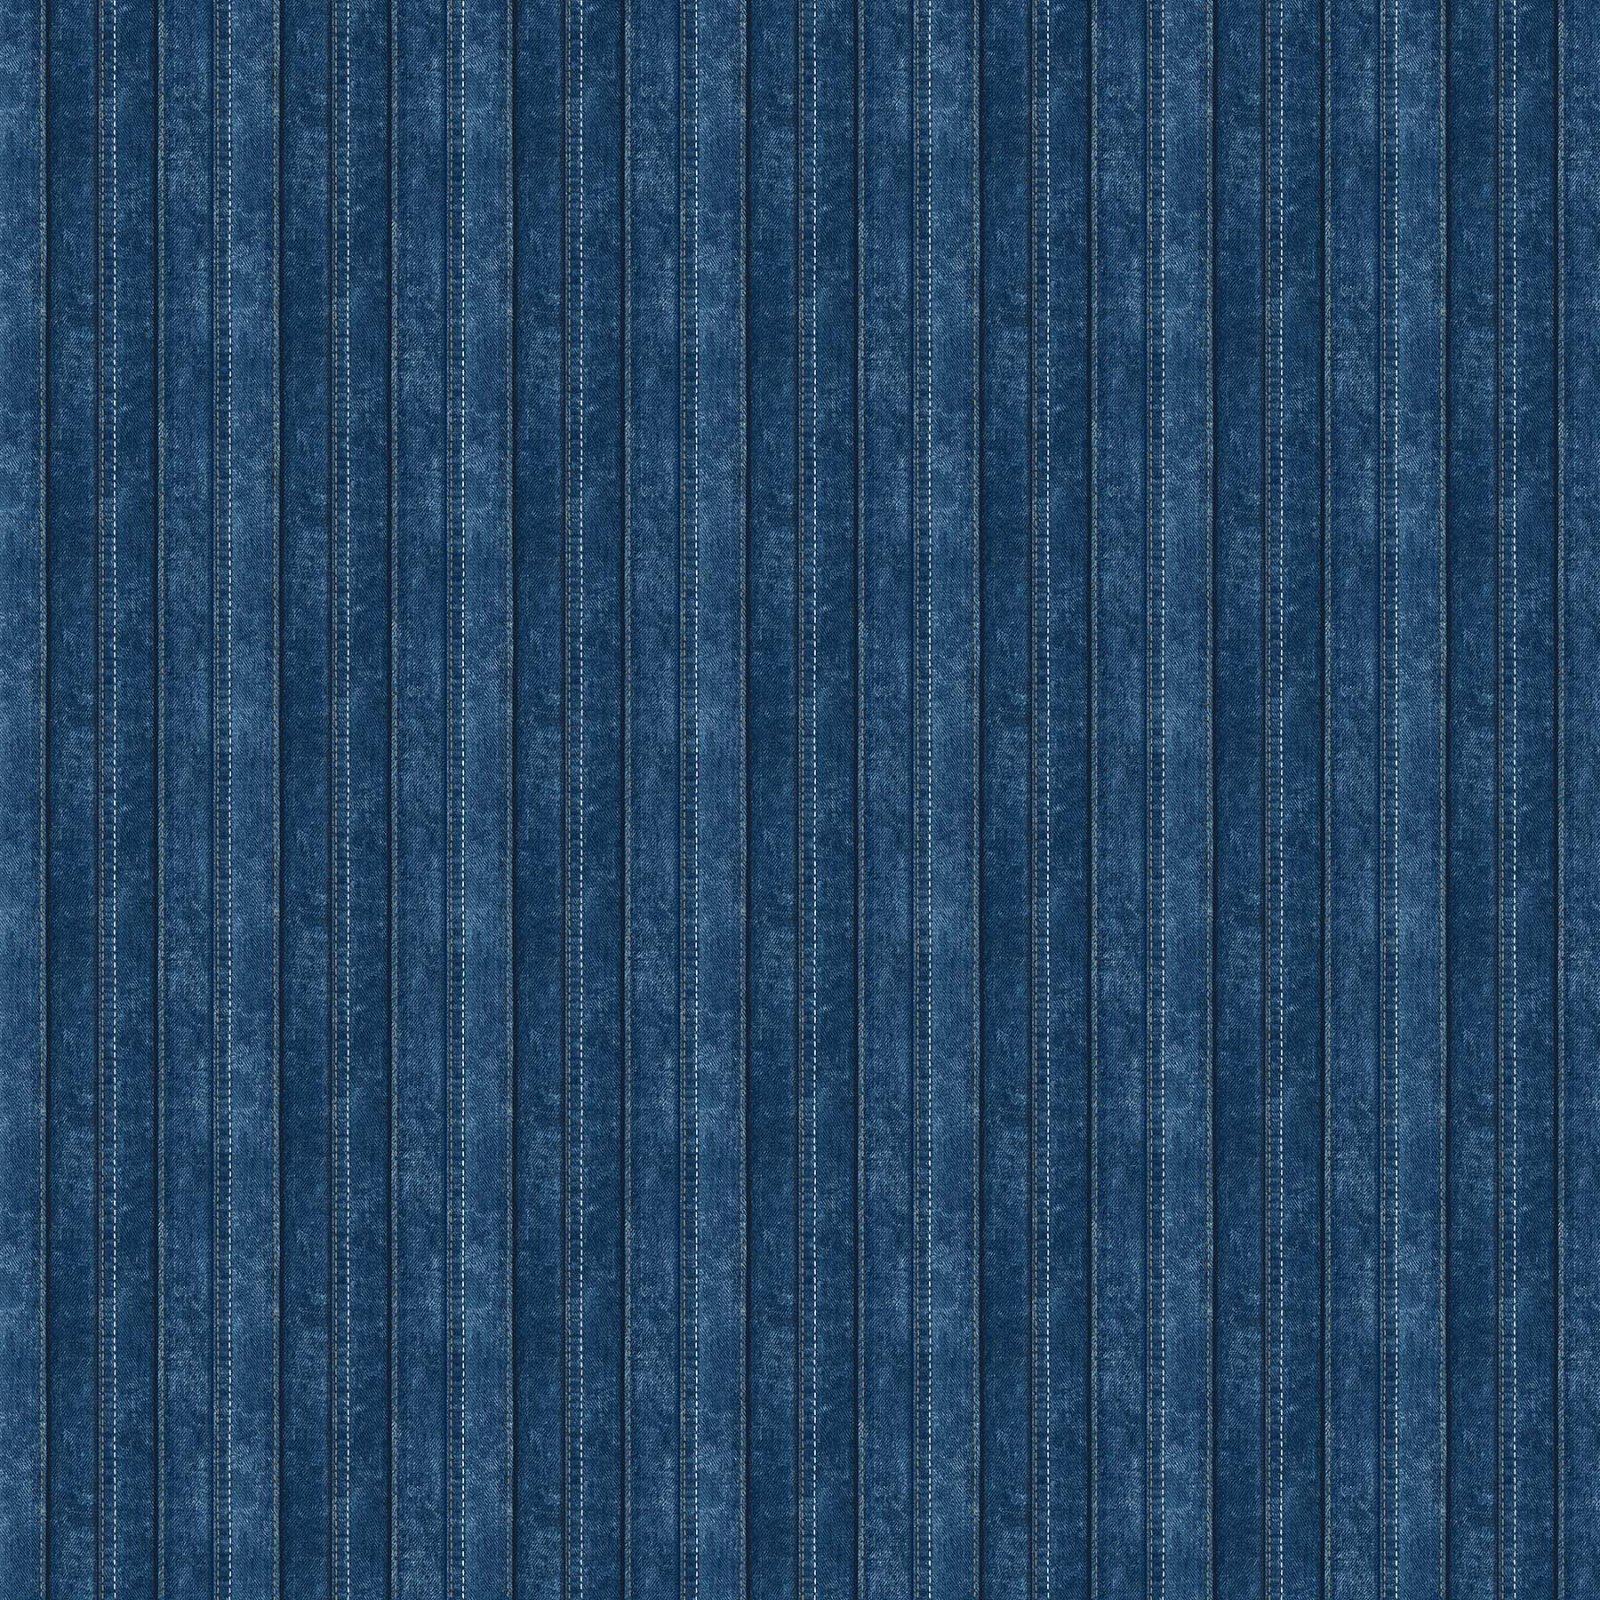 GOT THE BLUES DENIM STRIPE DARK BLUE 23379-48